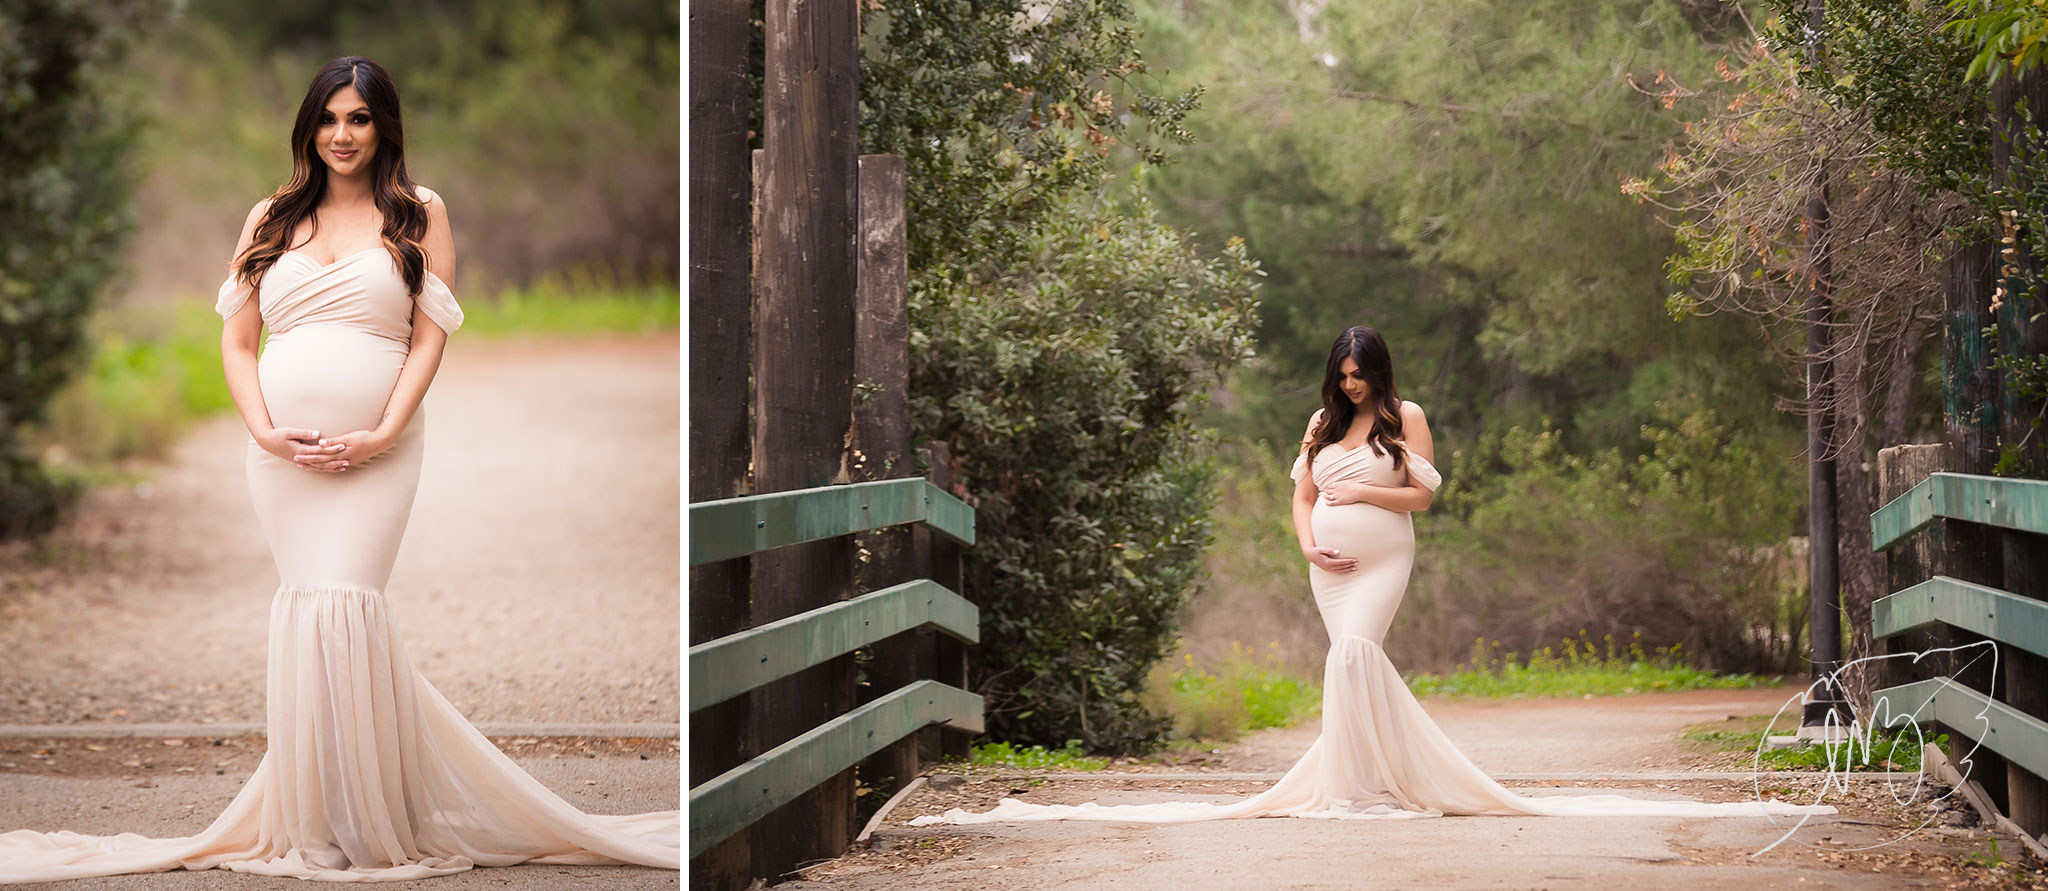 California_Inland_Empire_Maternity_Photographer_04.jpg